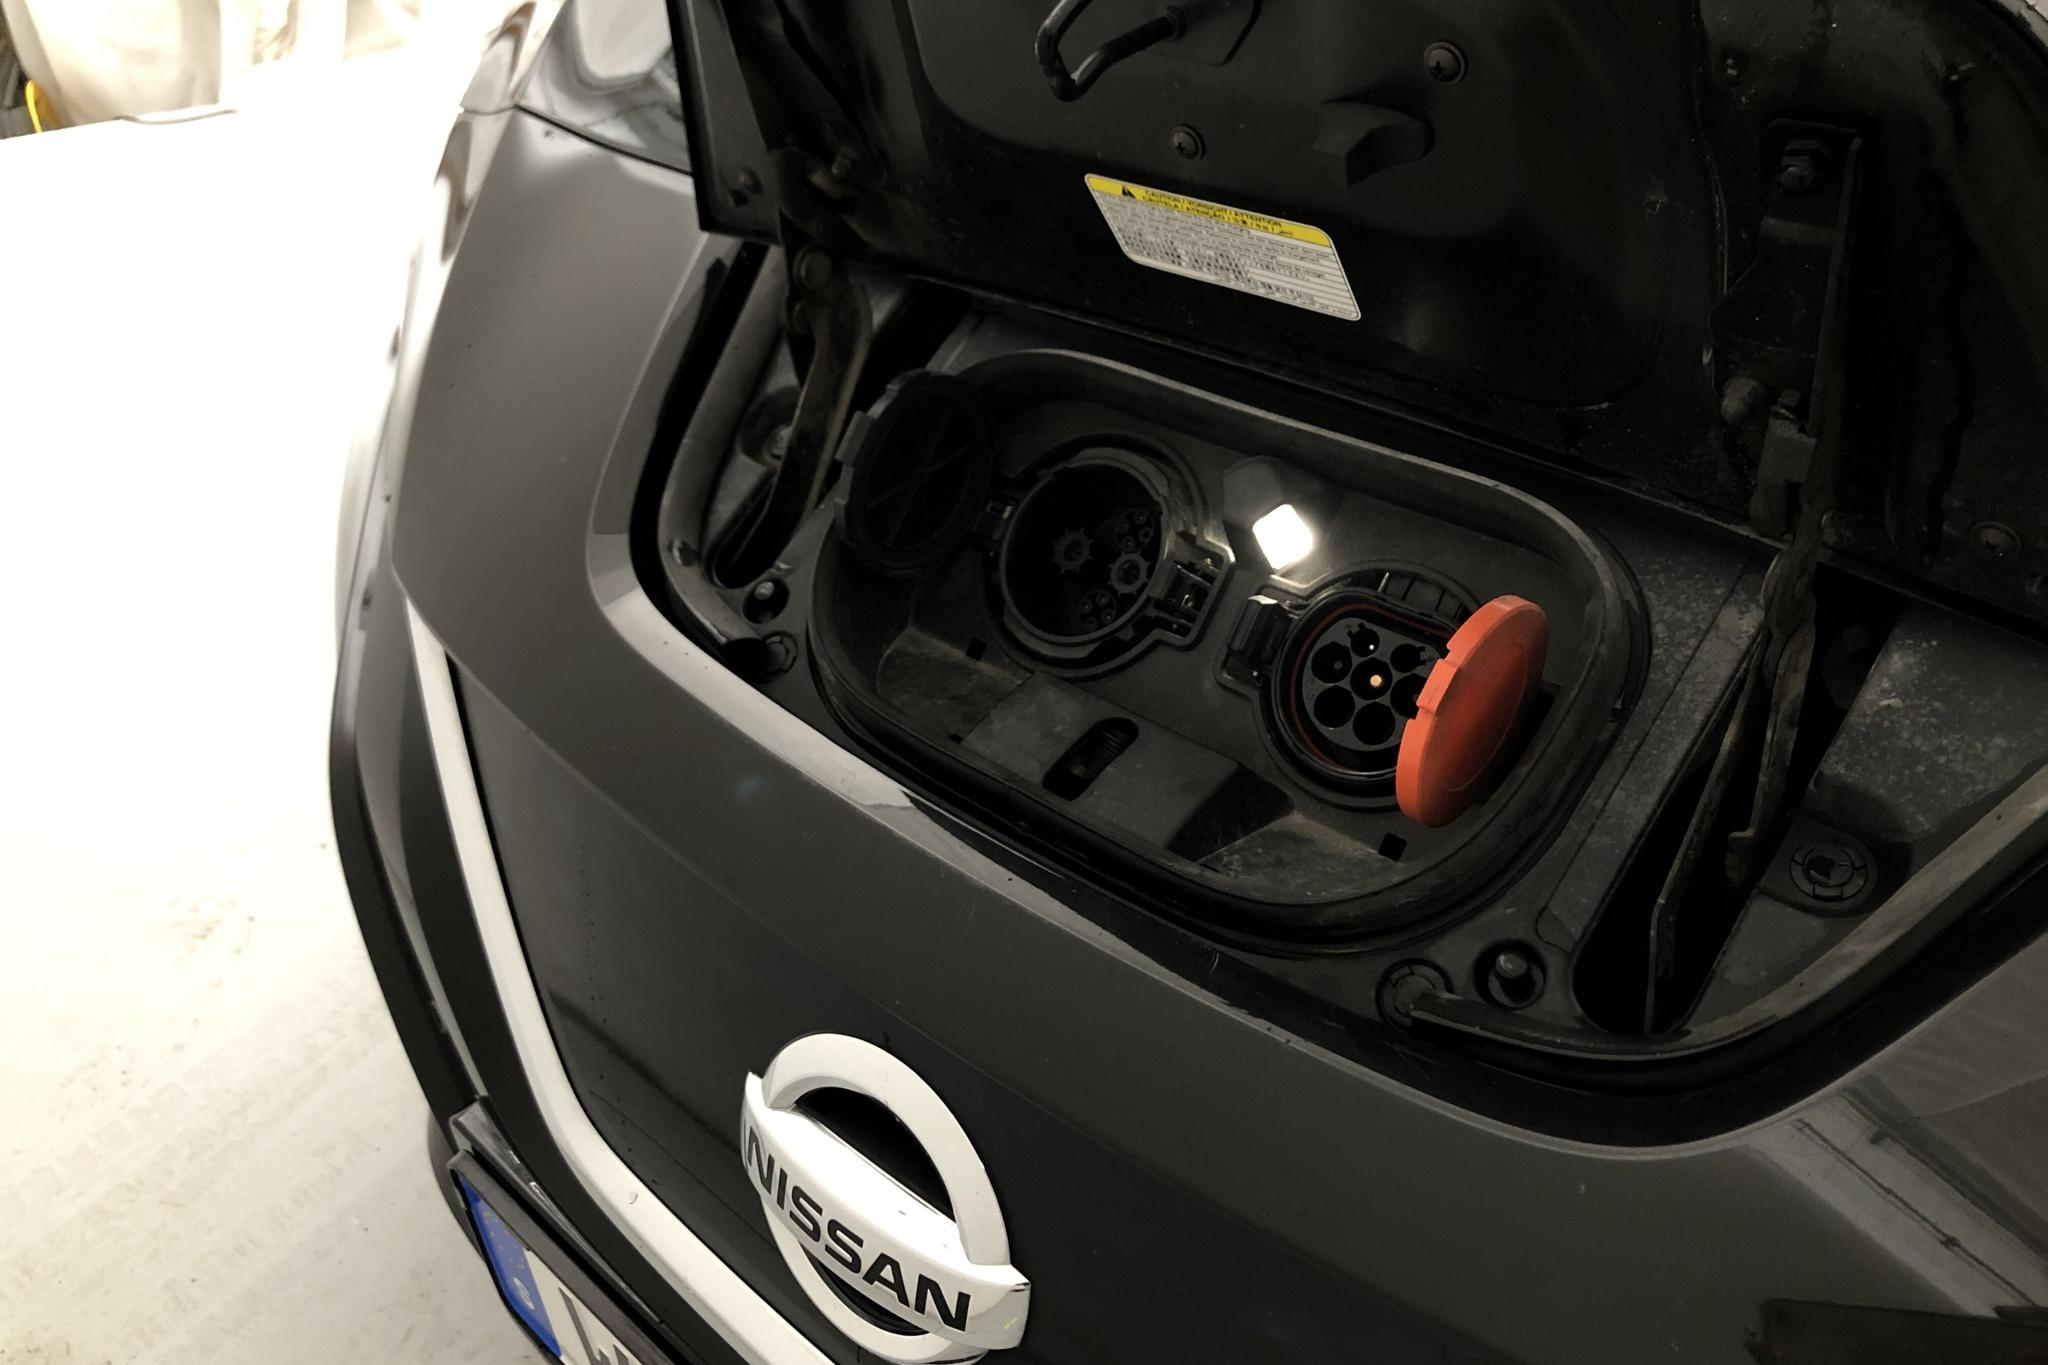 Nissan LEAF 5dr 40 kWh (150hk) - 139 520 km - Automatic - black - 2018